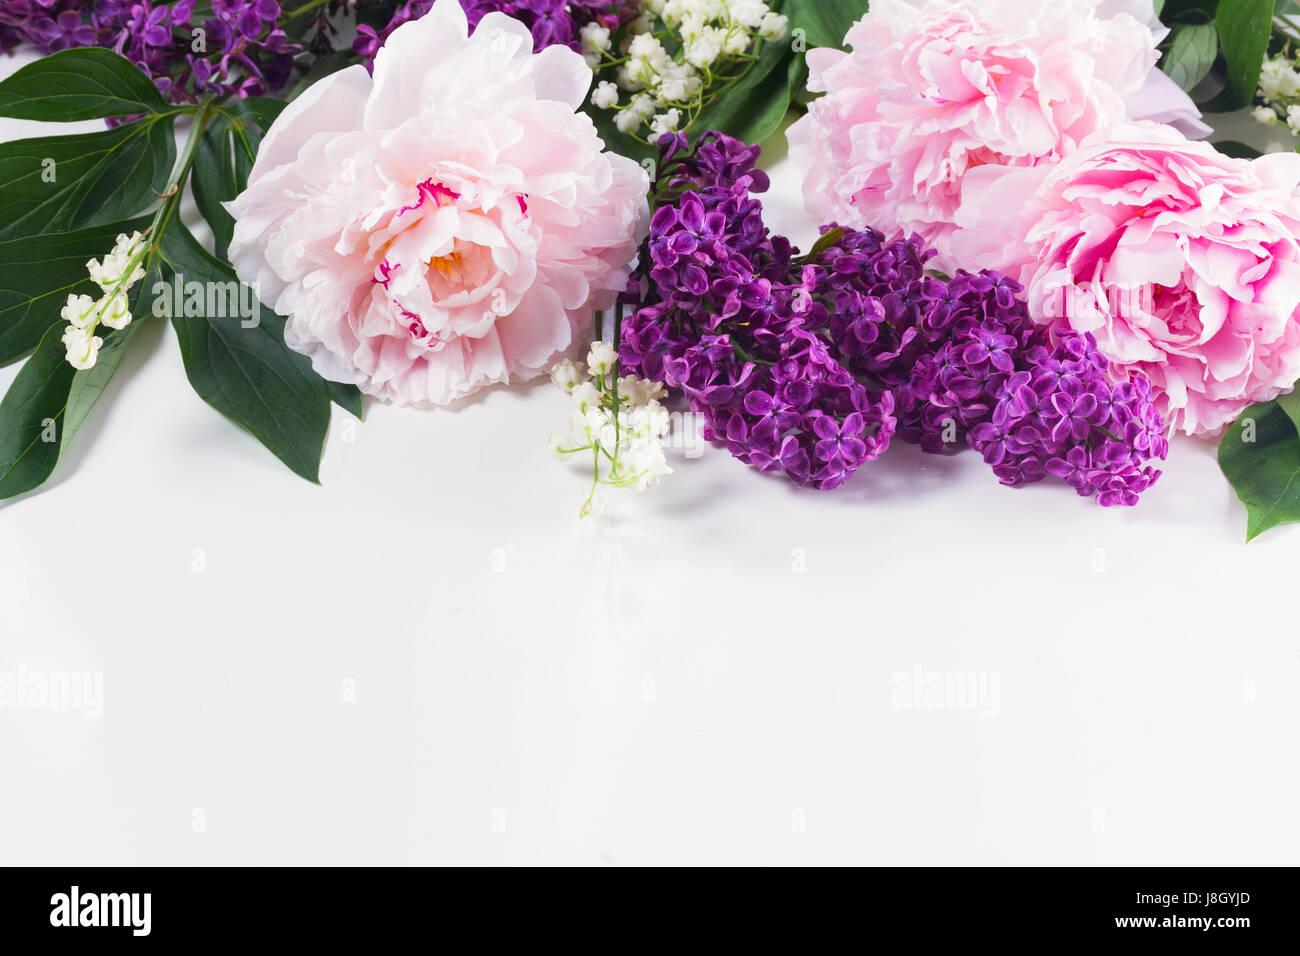 Fresh Flowers Decoration For Valentine